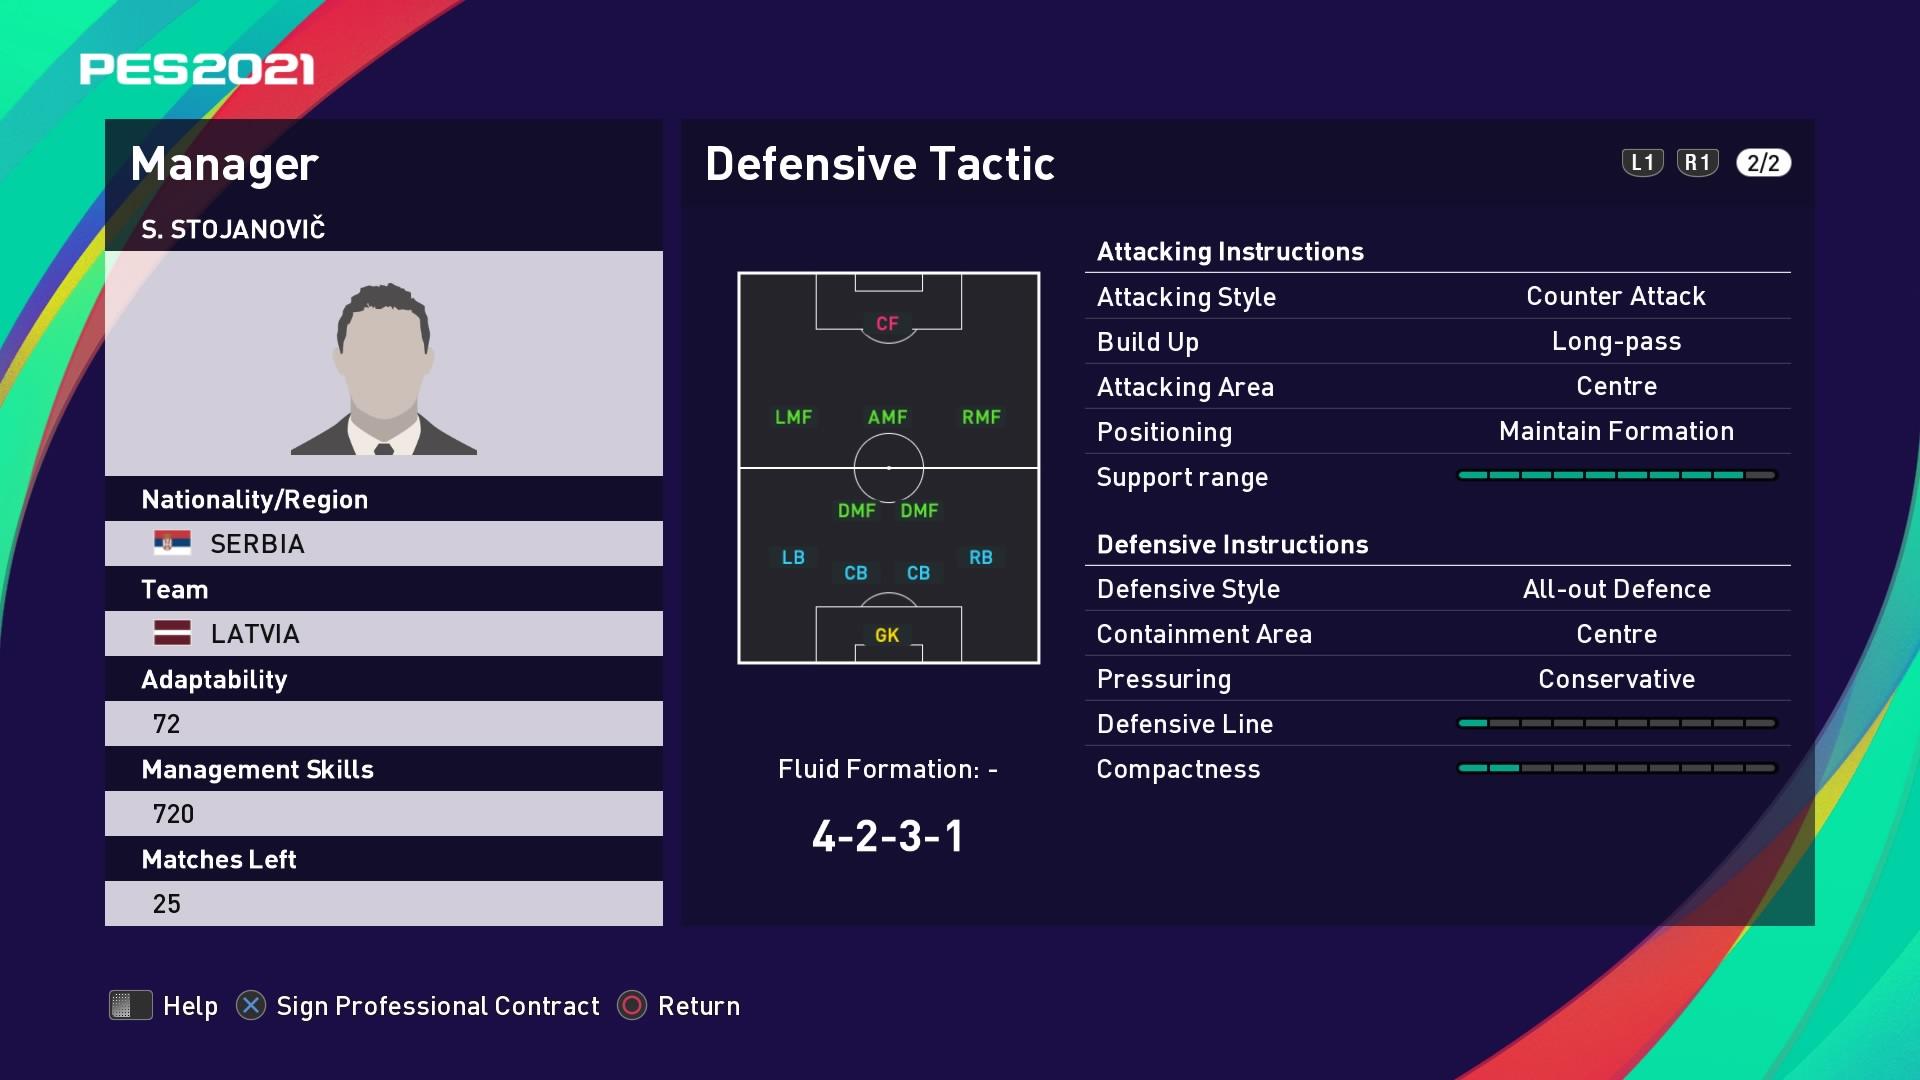 S. Stojanovič (Slaviša Stojanovič) Defensive Tactic in PES 2021 myClub